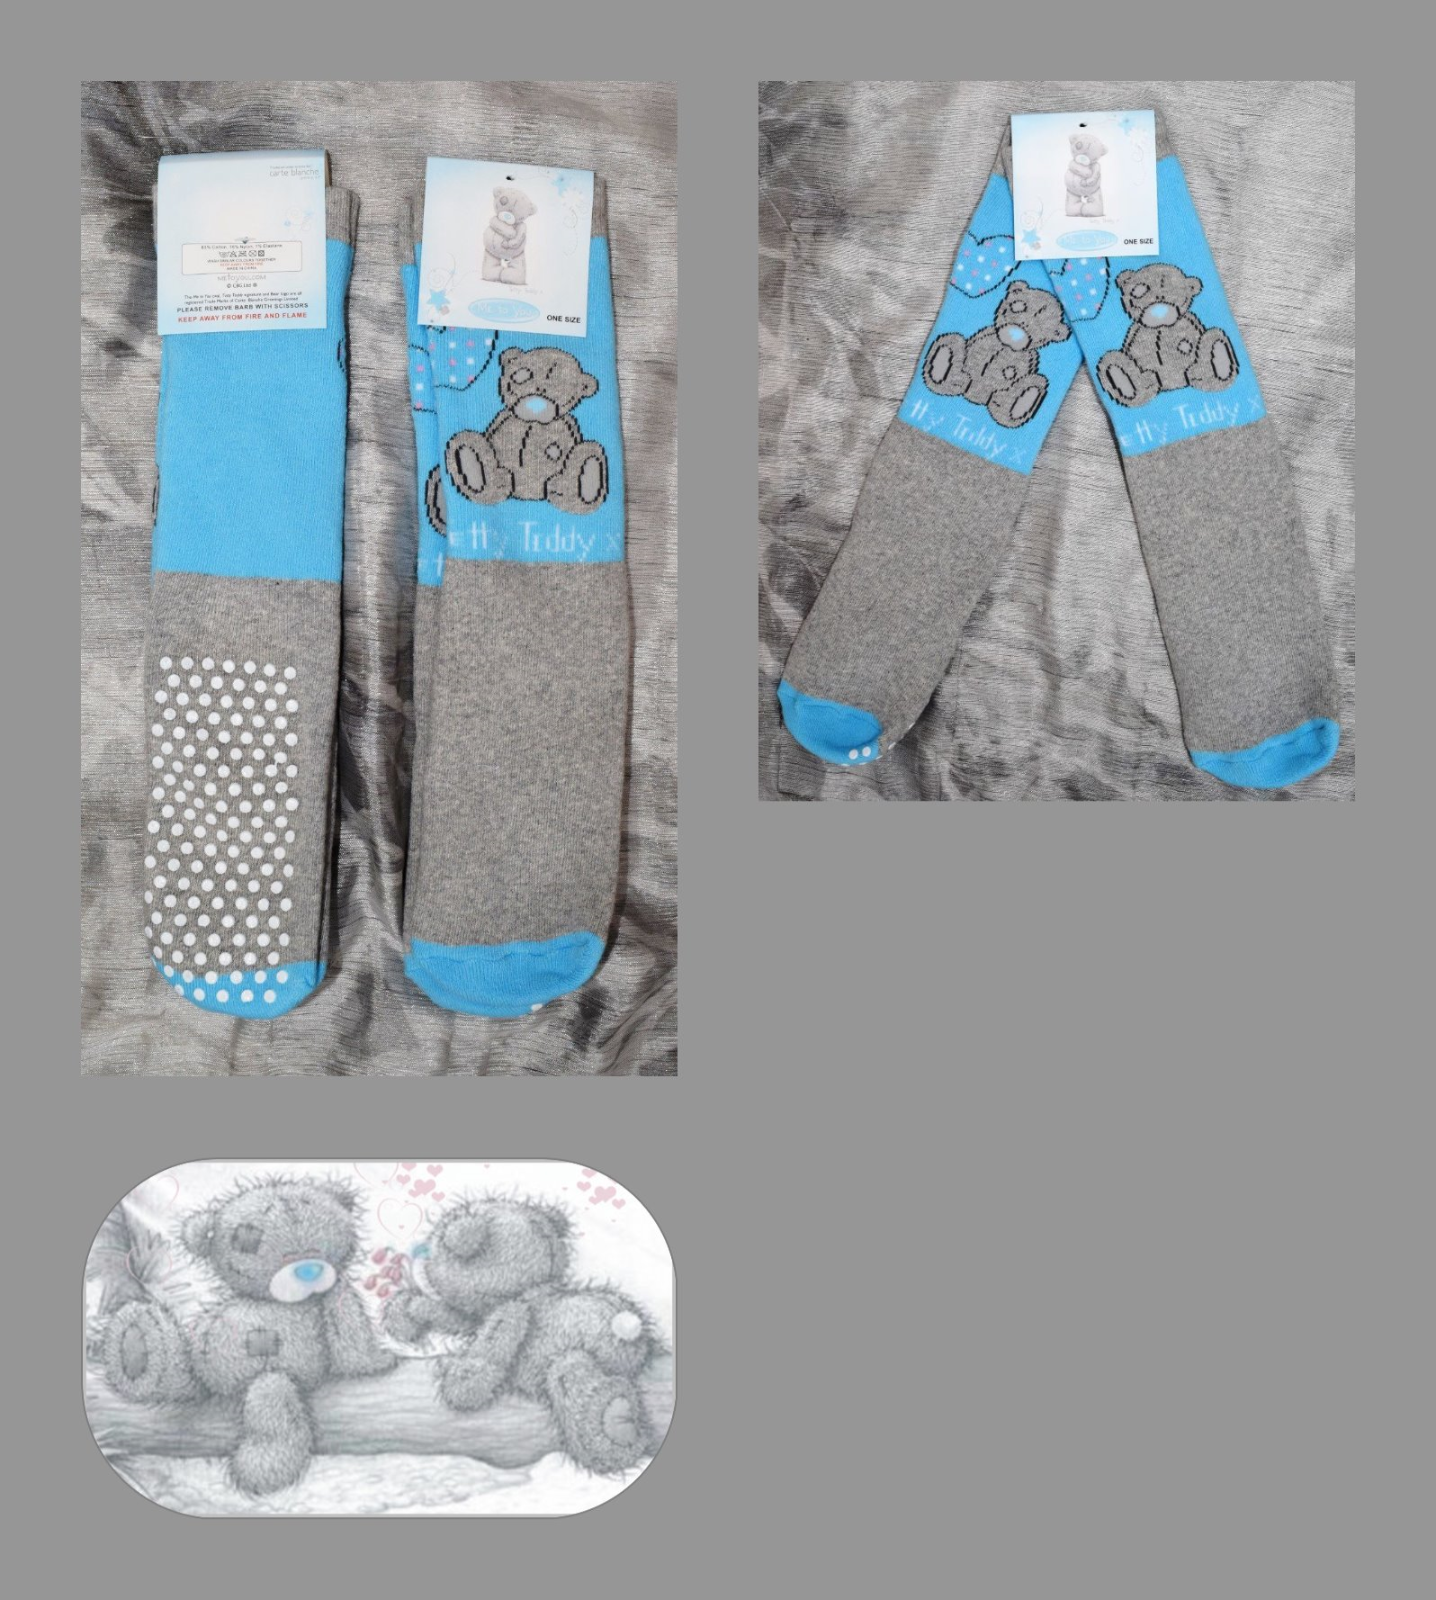 Me To You Tatty Teddy Slipper Socks Age 5-7 Years Blue/Grey (One Size) Bnwt 3